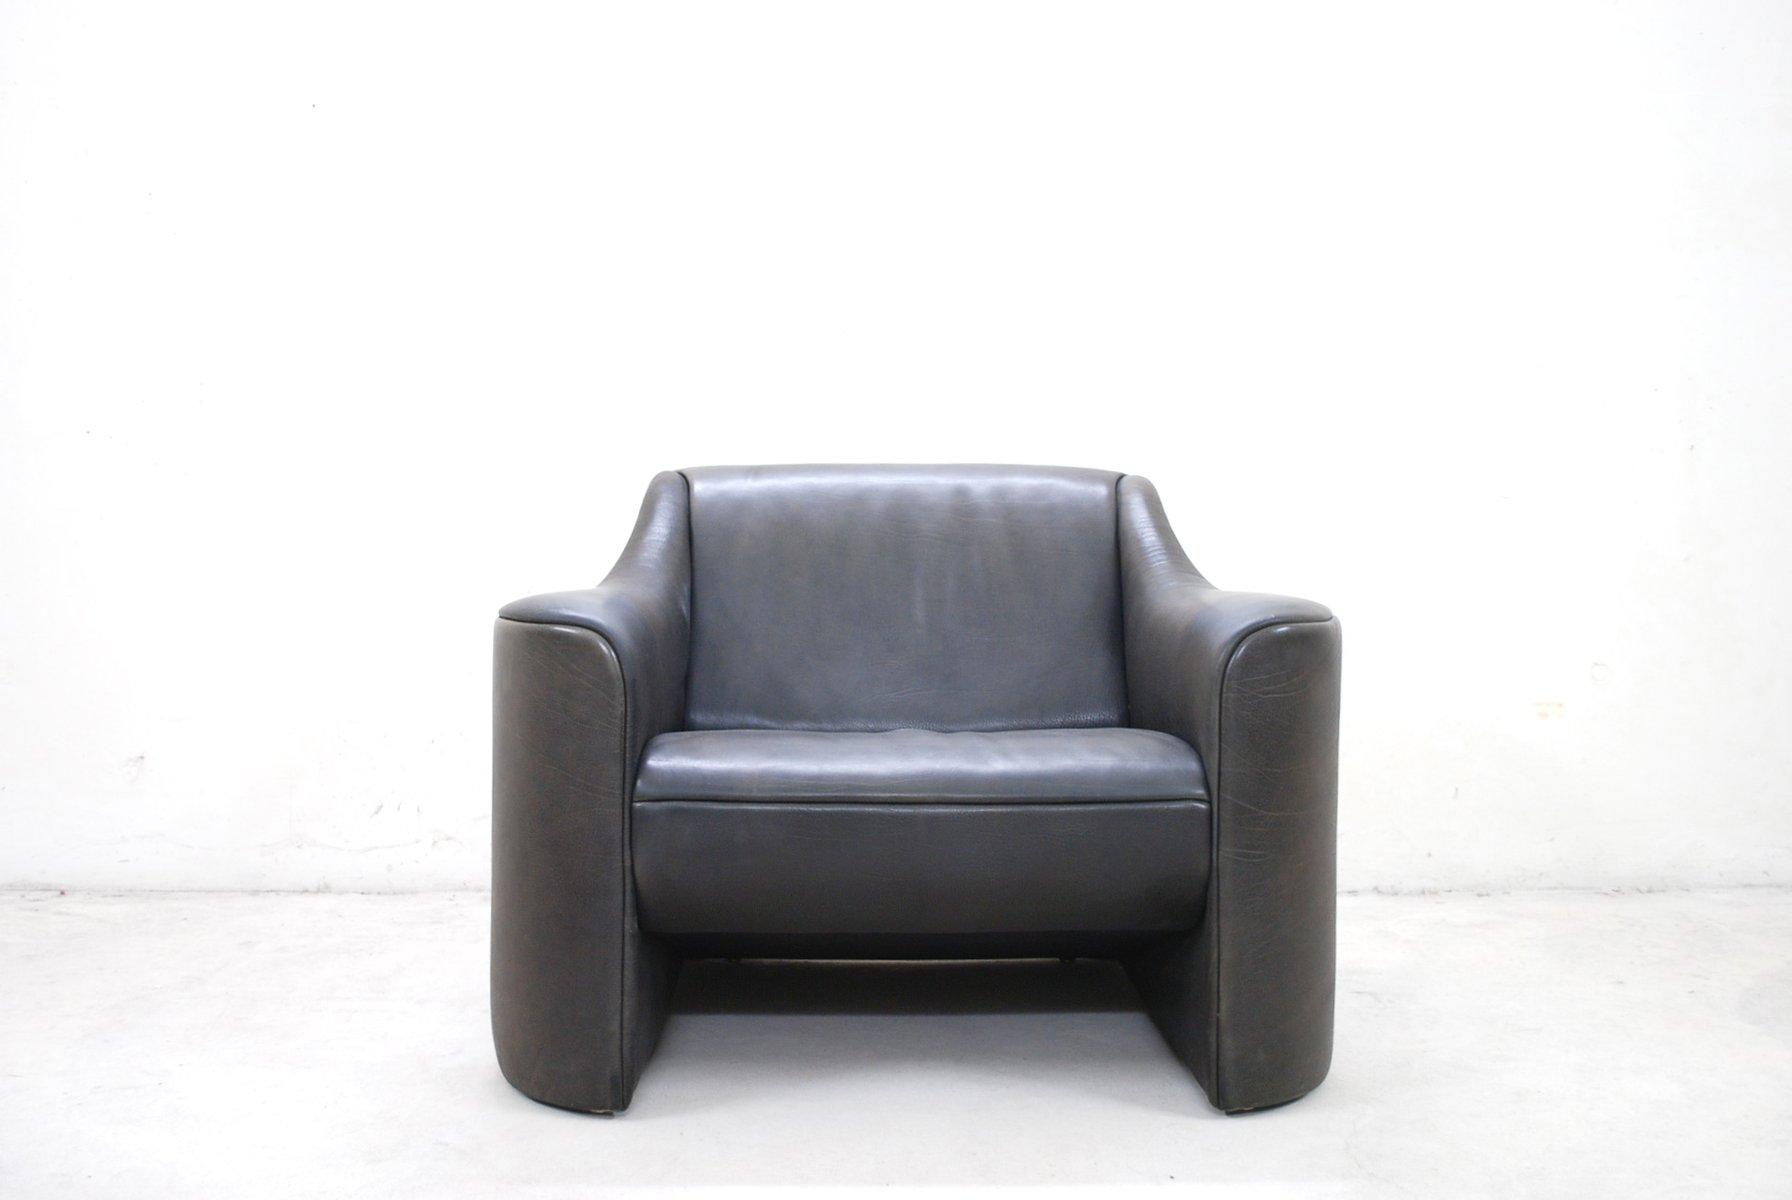 Italian Esquire Leather Armchair Club Chair by Luigi Massoni